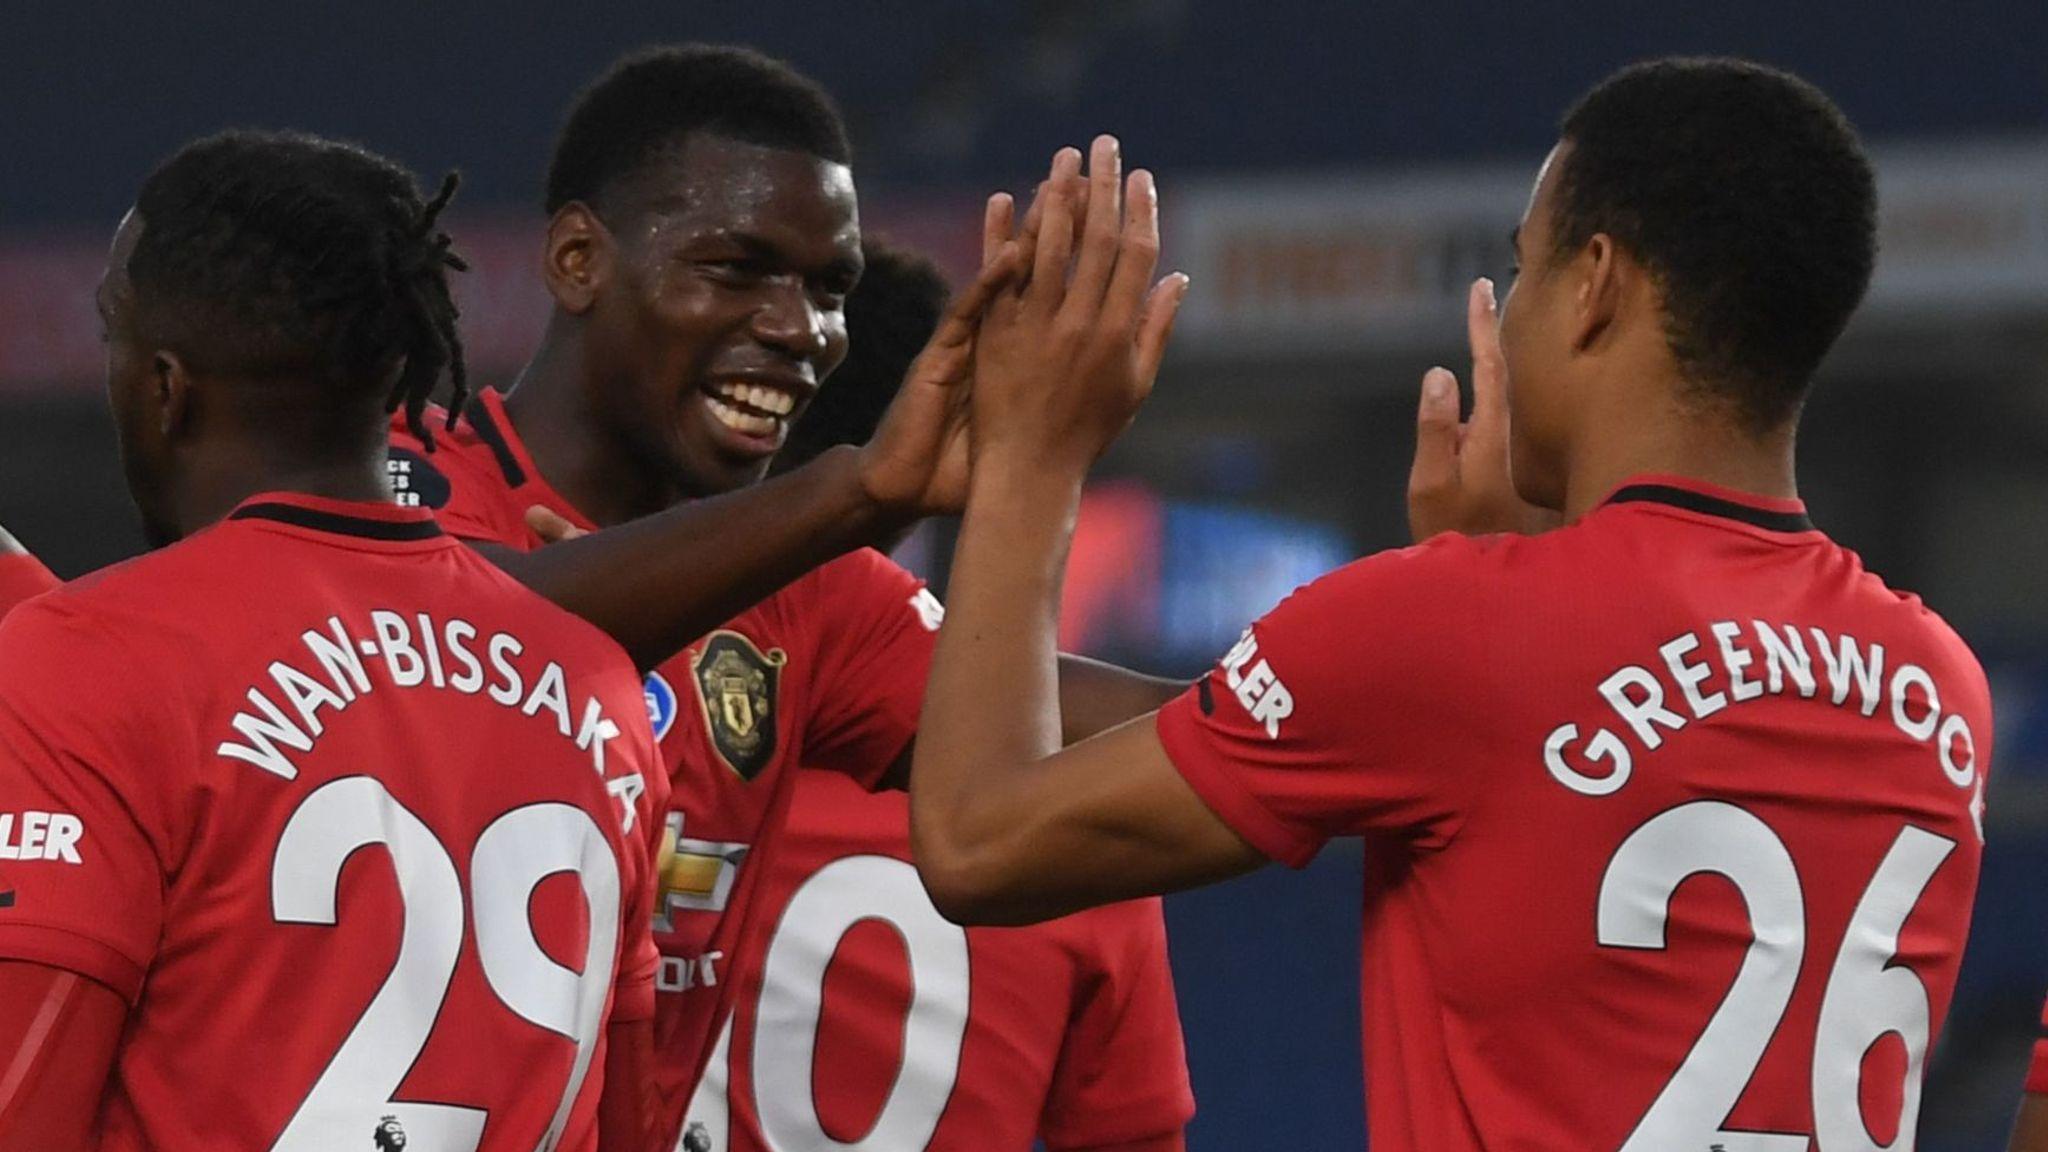 Live match preview - Man Utd vs B'mouth 04.07.2020